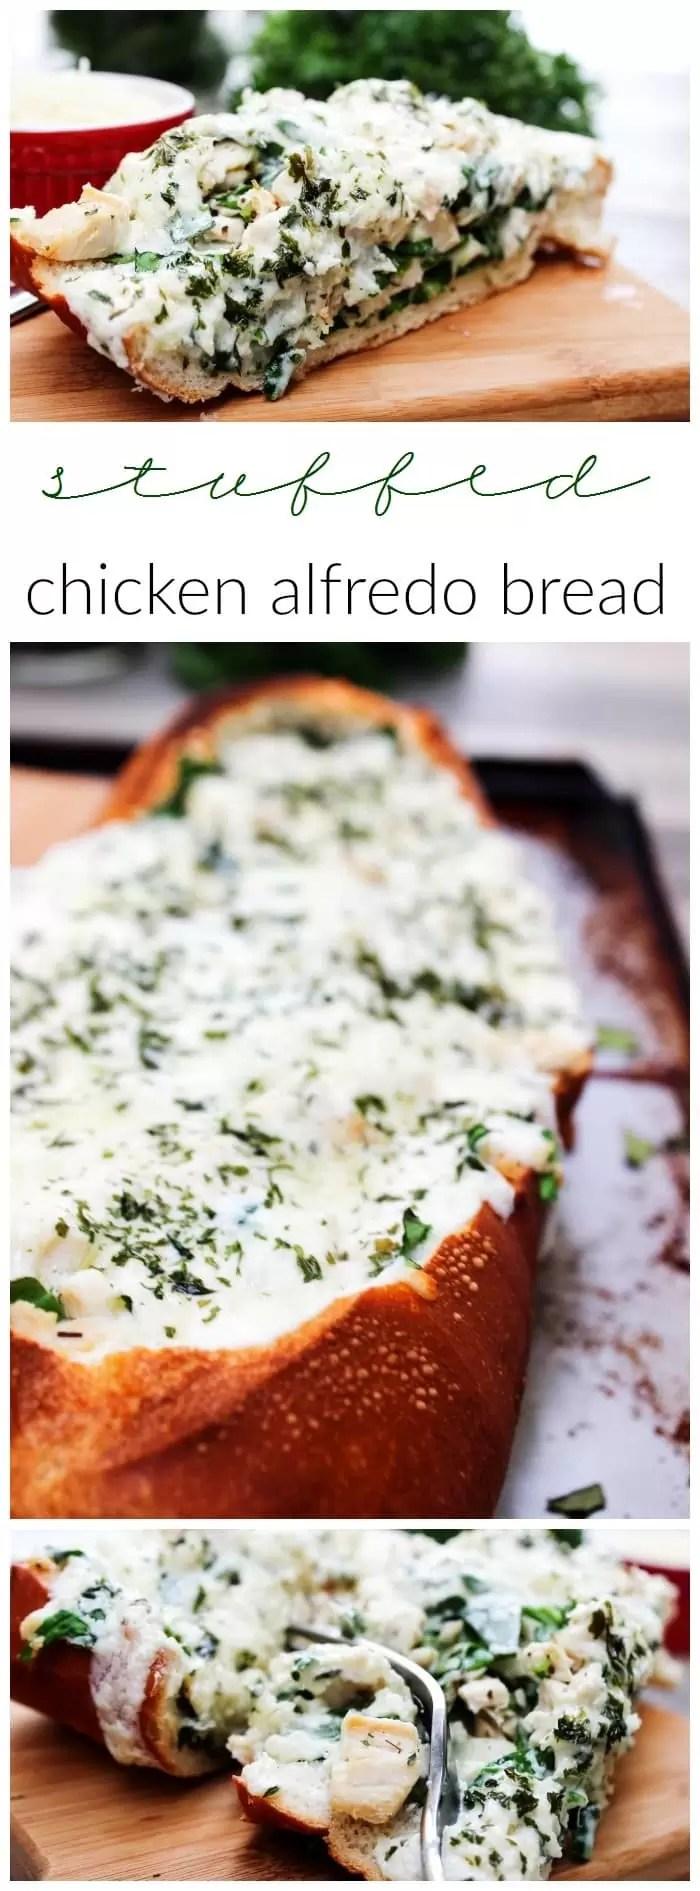 rotissoire chicken alfredo bread. LOVE this stuff!